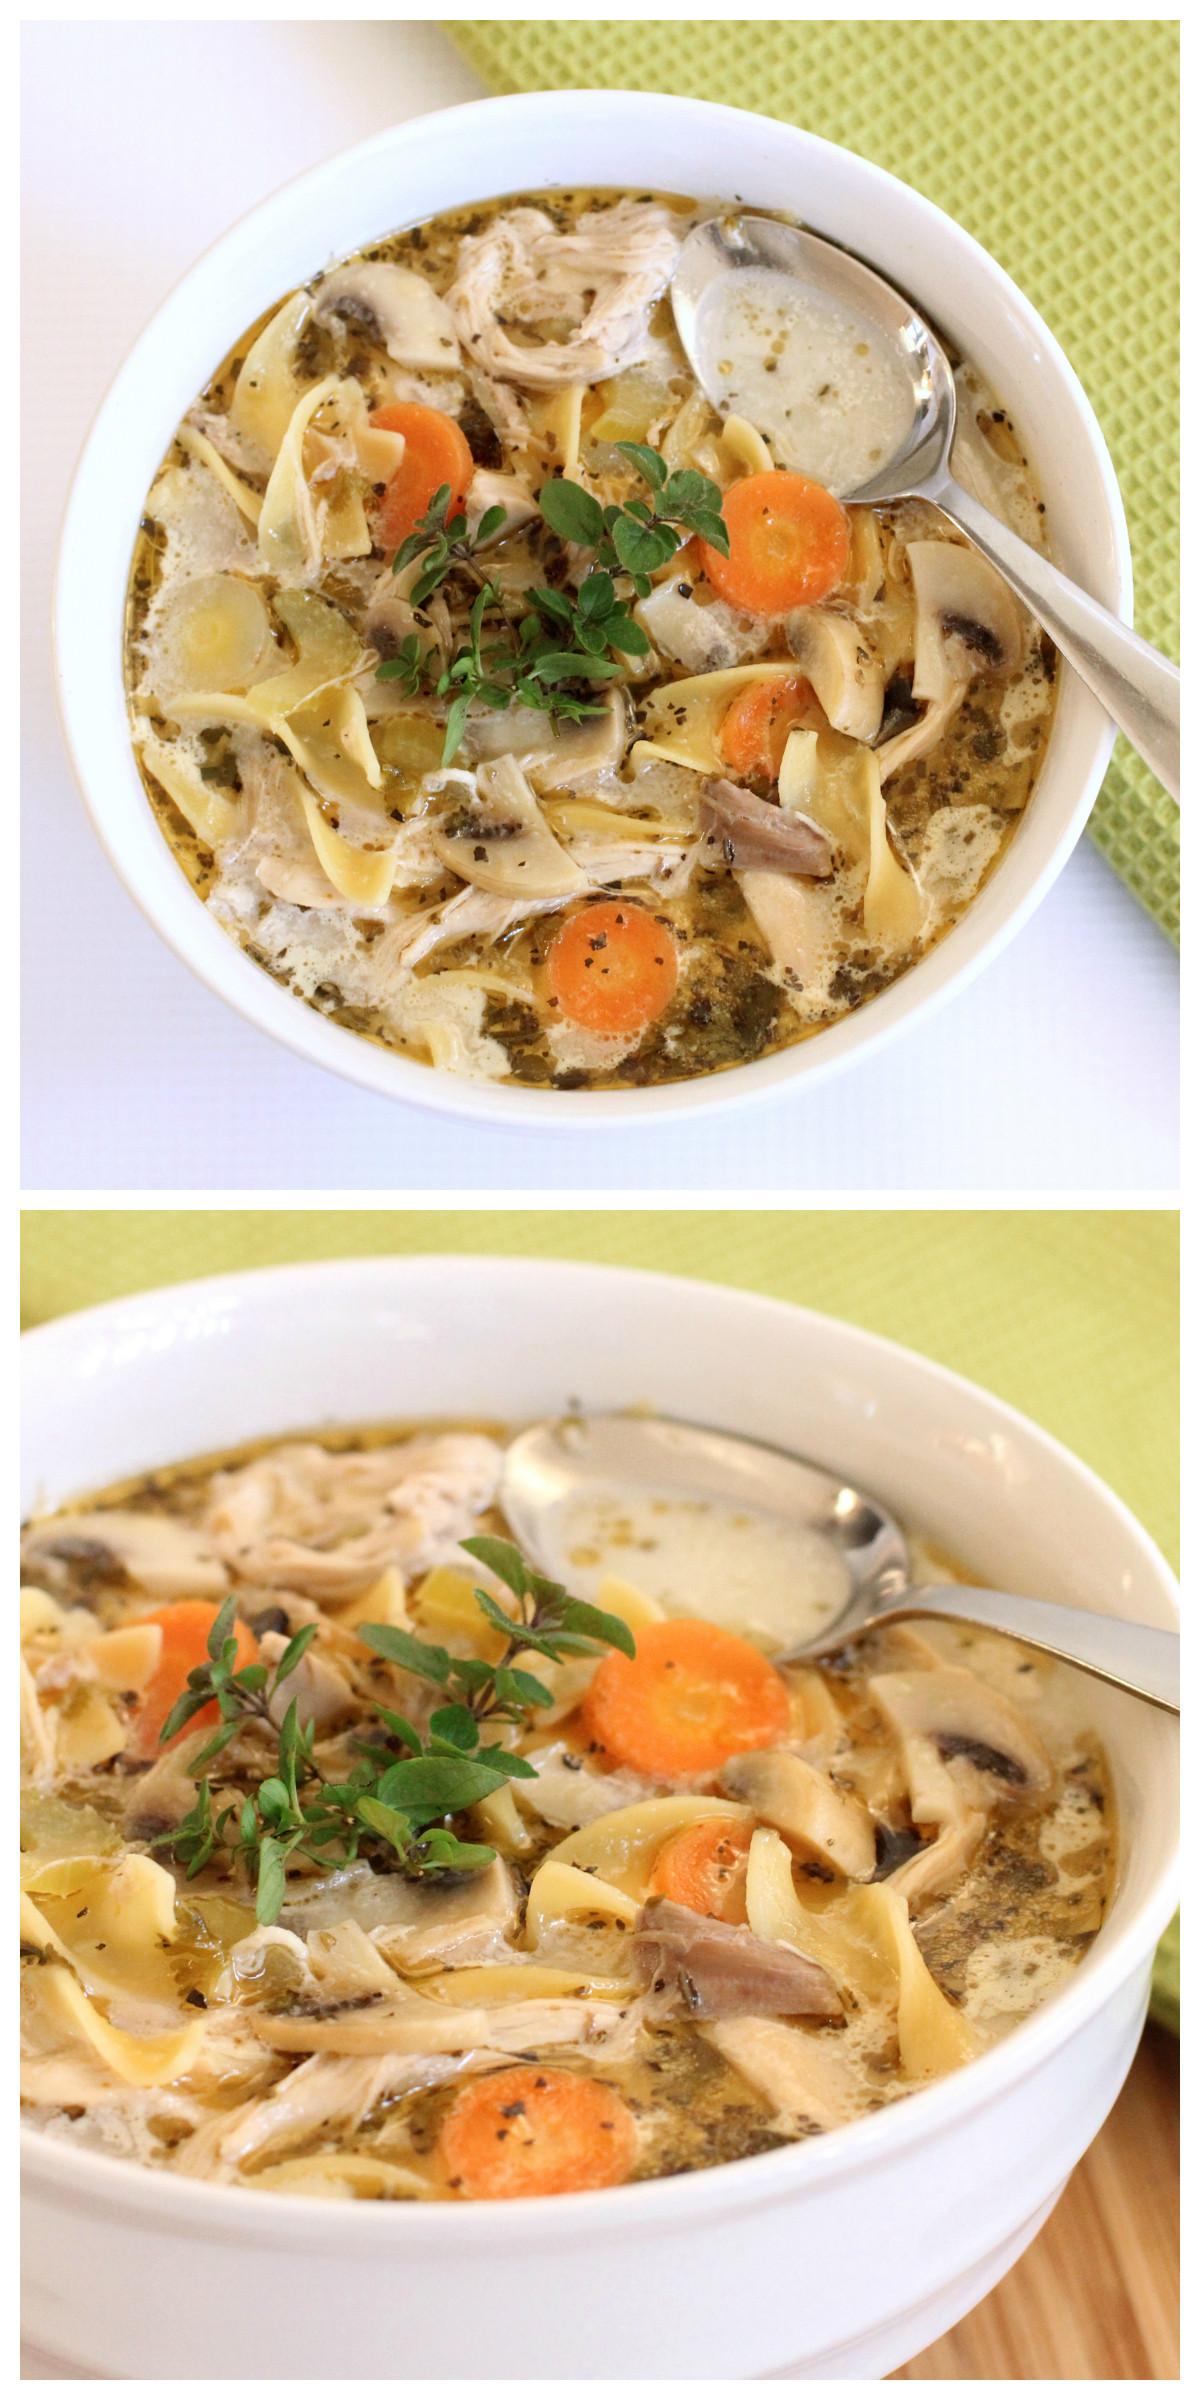 Best Chicken Noodle Soup  The Best Chicken Noodle Soup You ll Ever Eat Dabbles